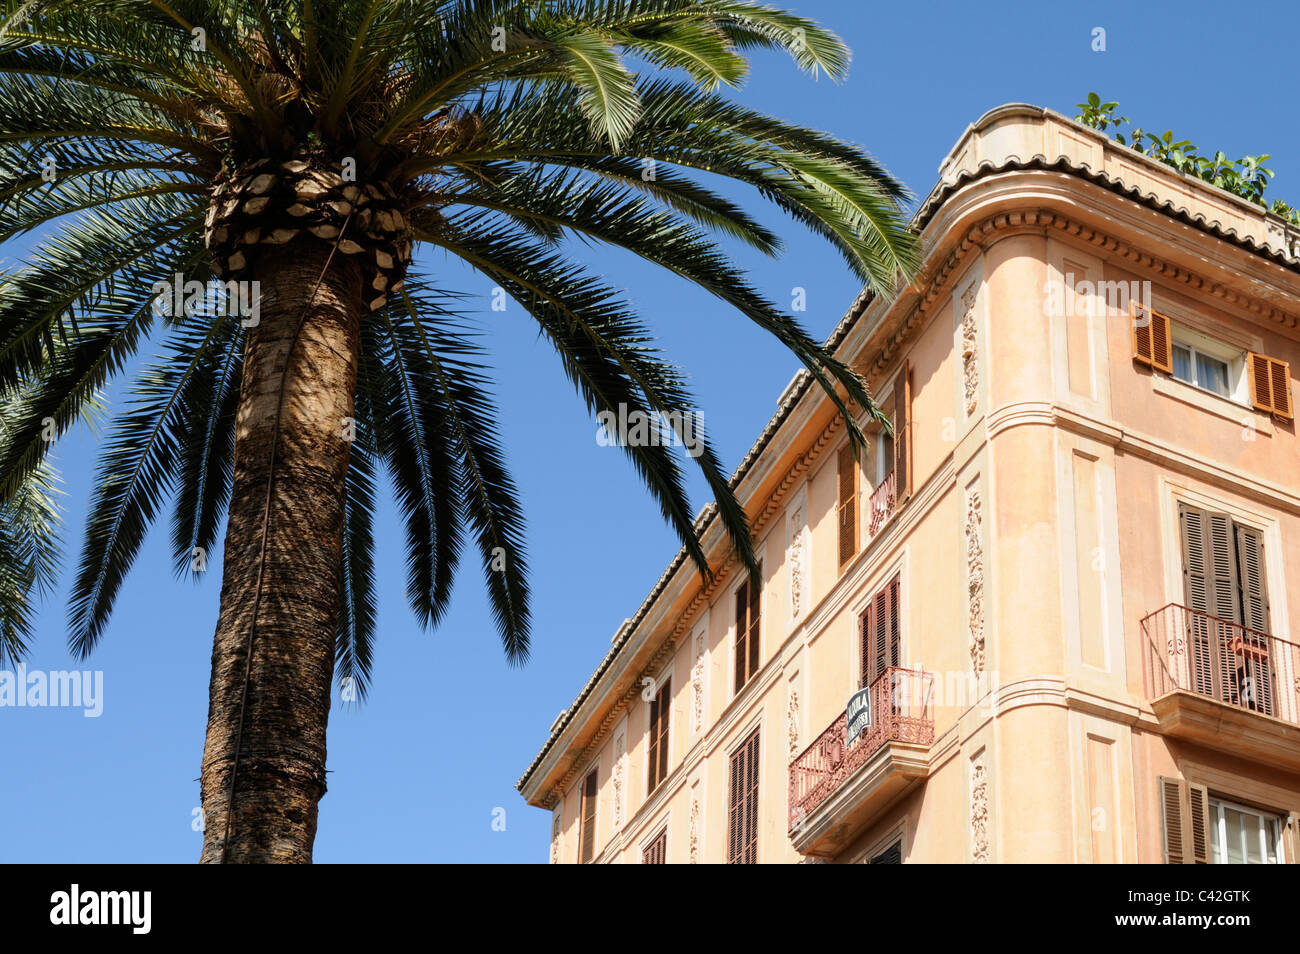 Haus und Palme vor blauem Himmel, Palma, Mallorca, Spanien. - House and palm tree against blue sky, Palma, Majorca, Stock Photo